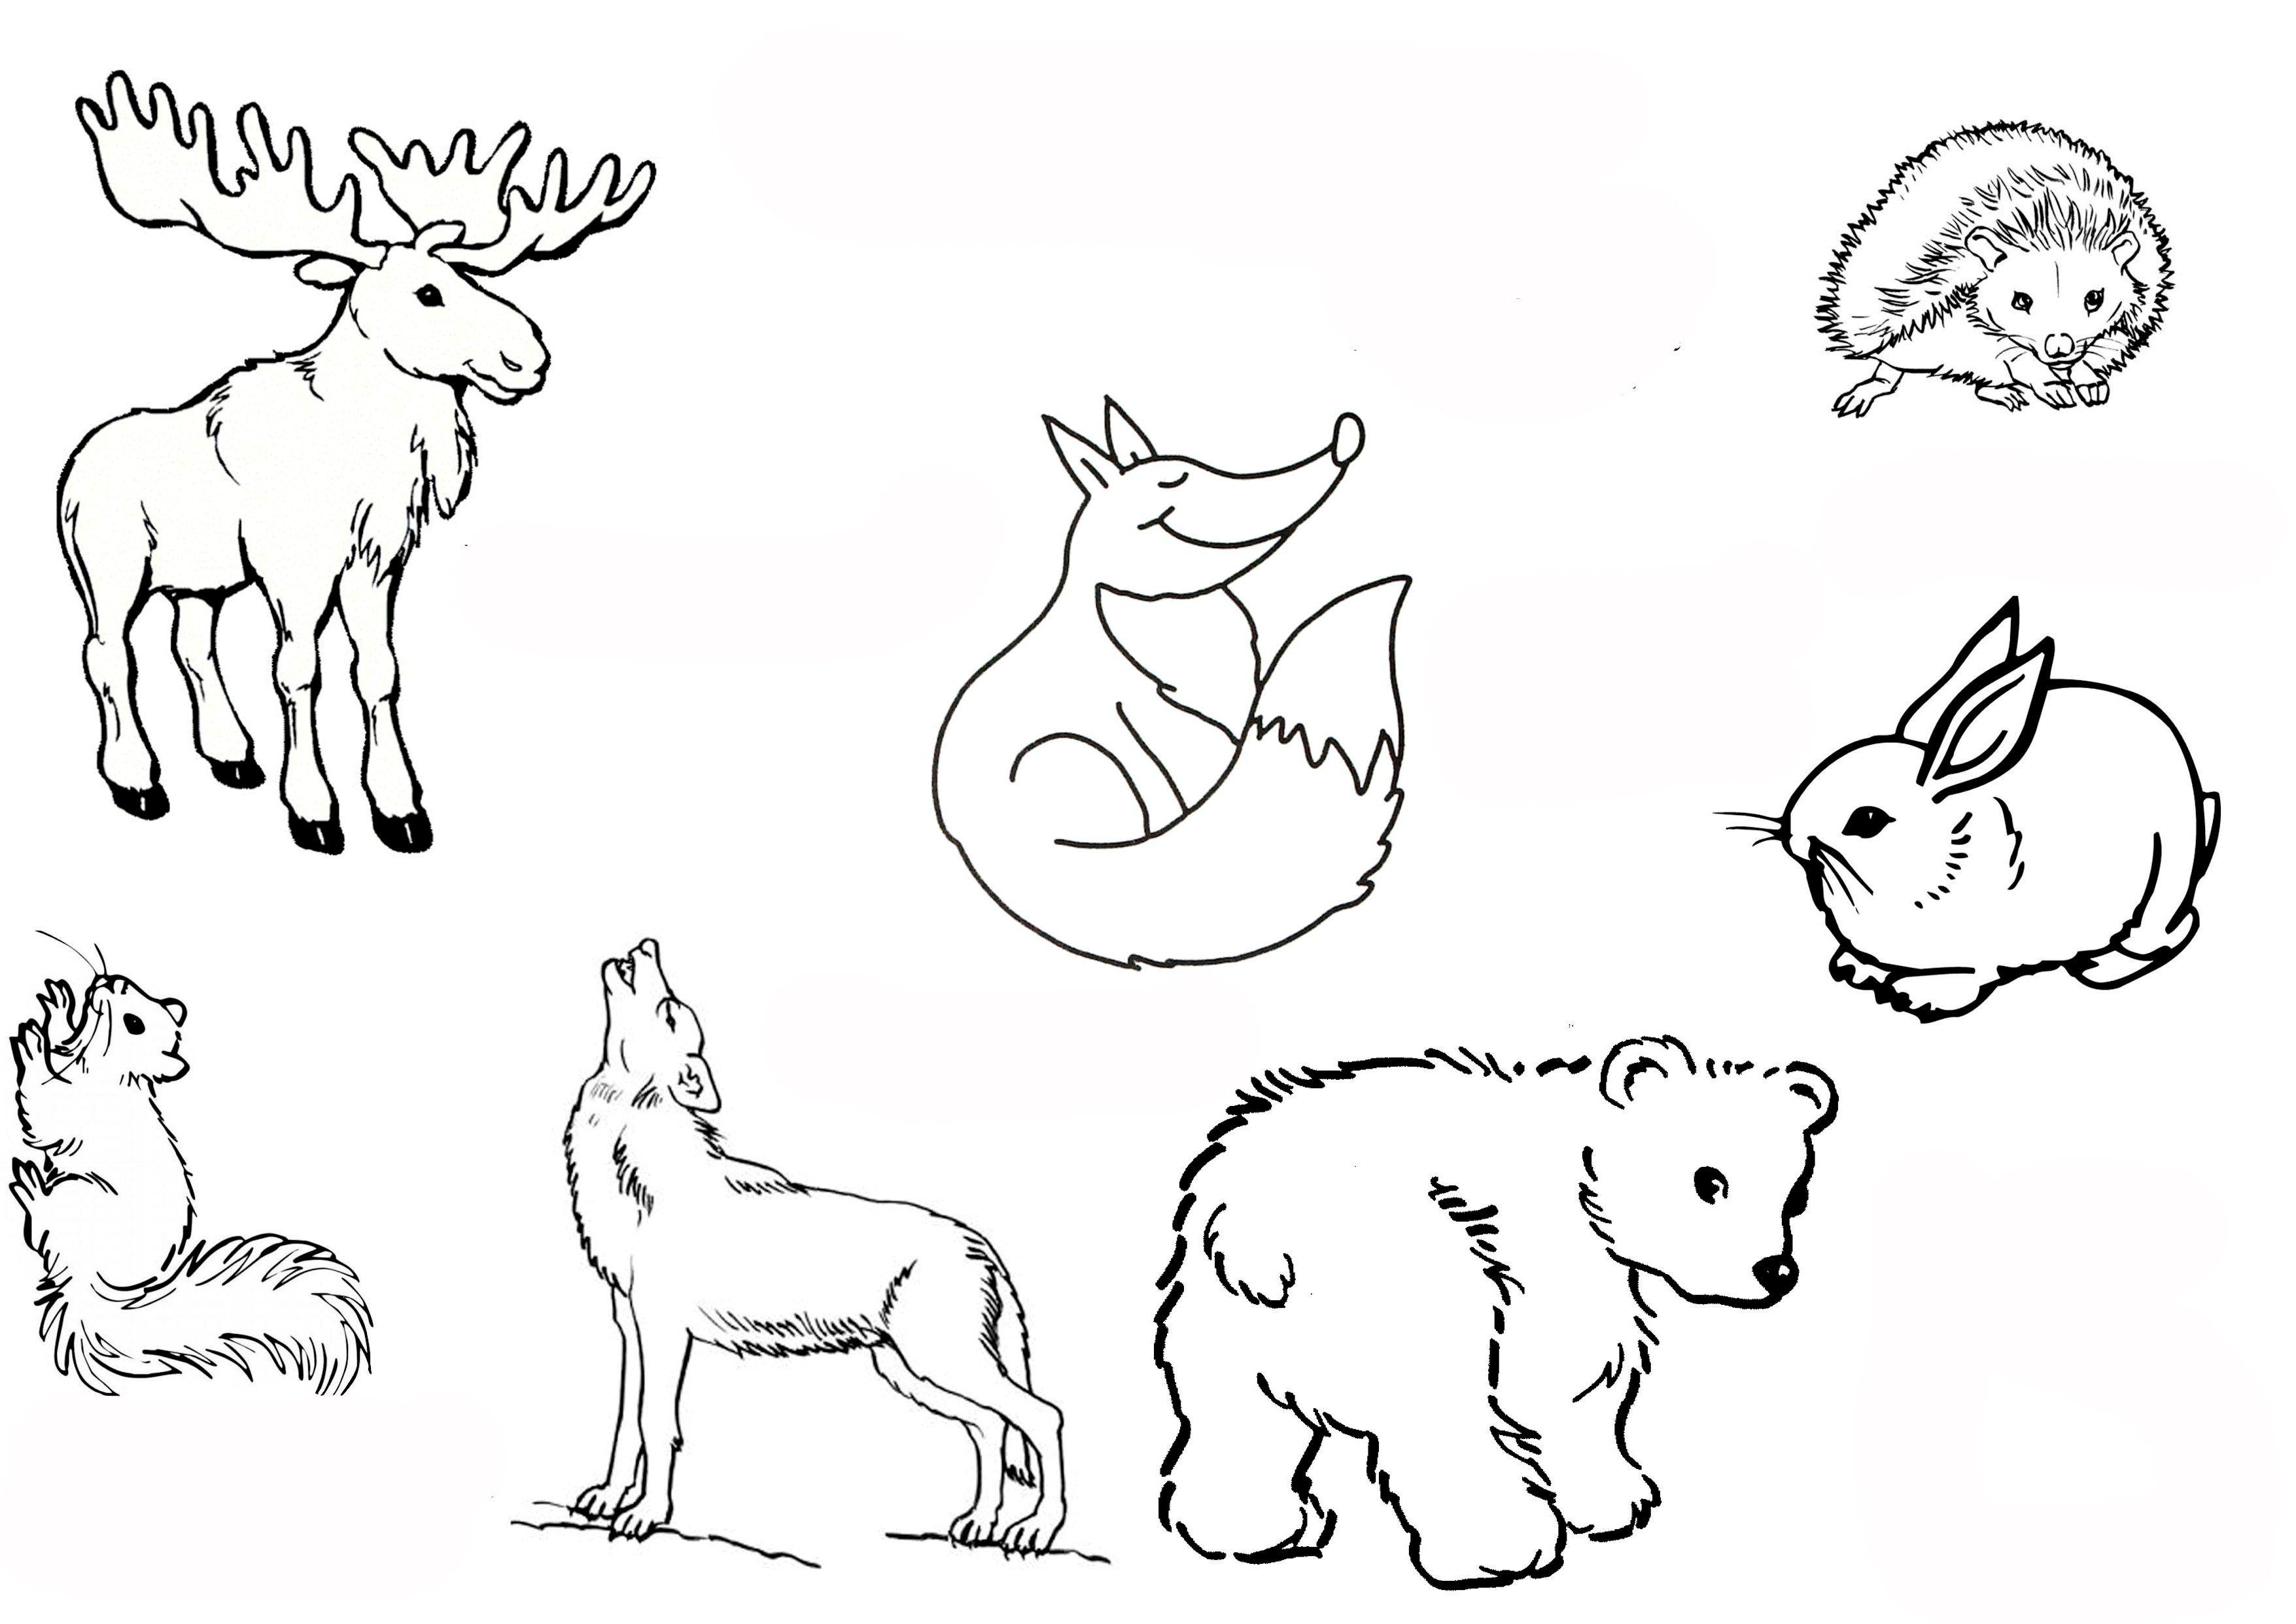 Waldtiere Ausmalbilder Waldtiere Ausmalbilder Tiere